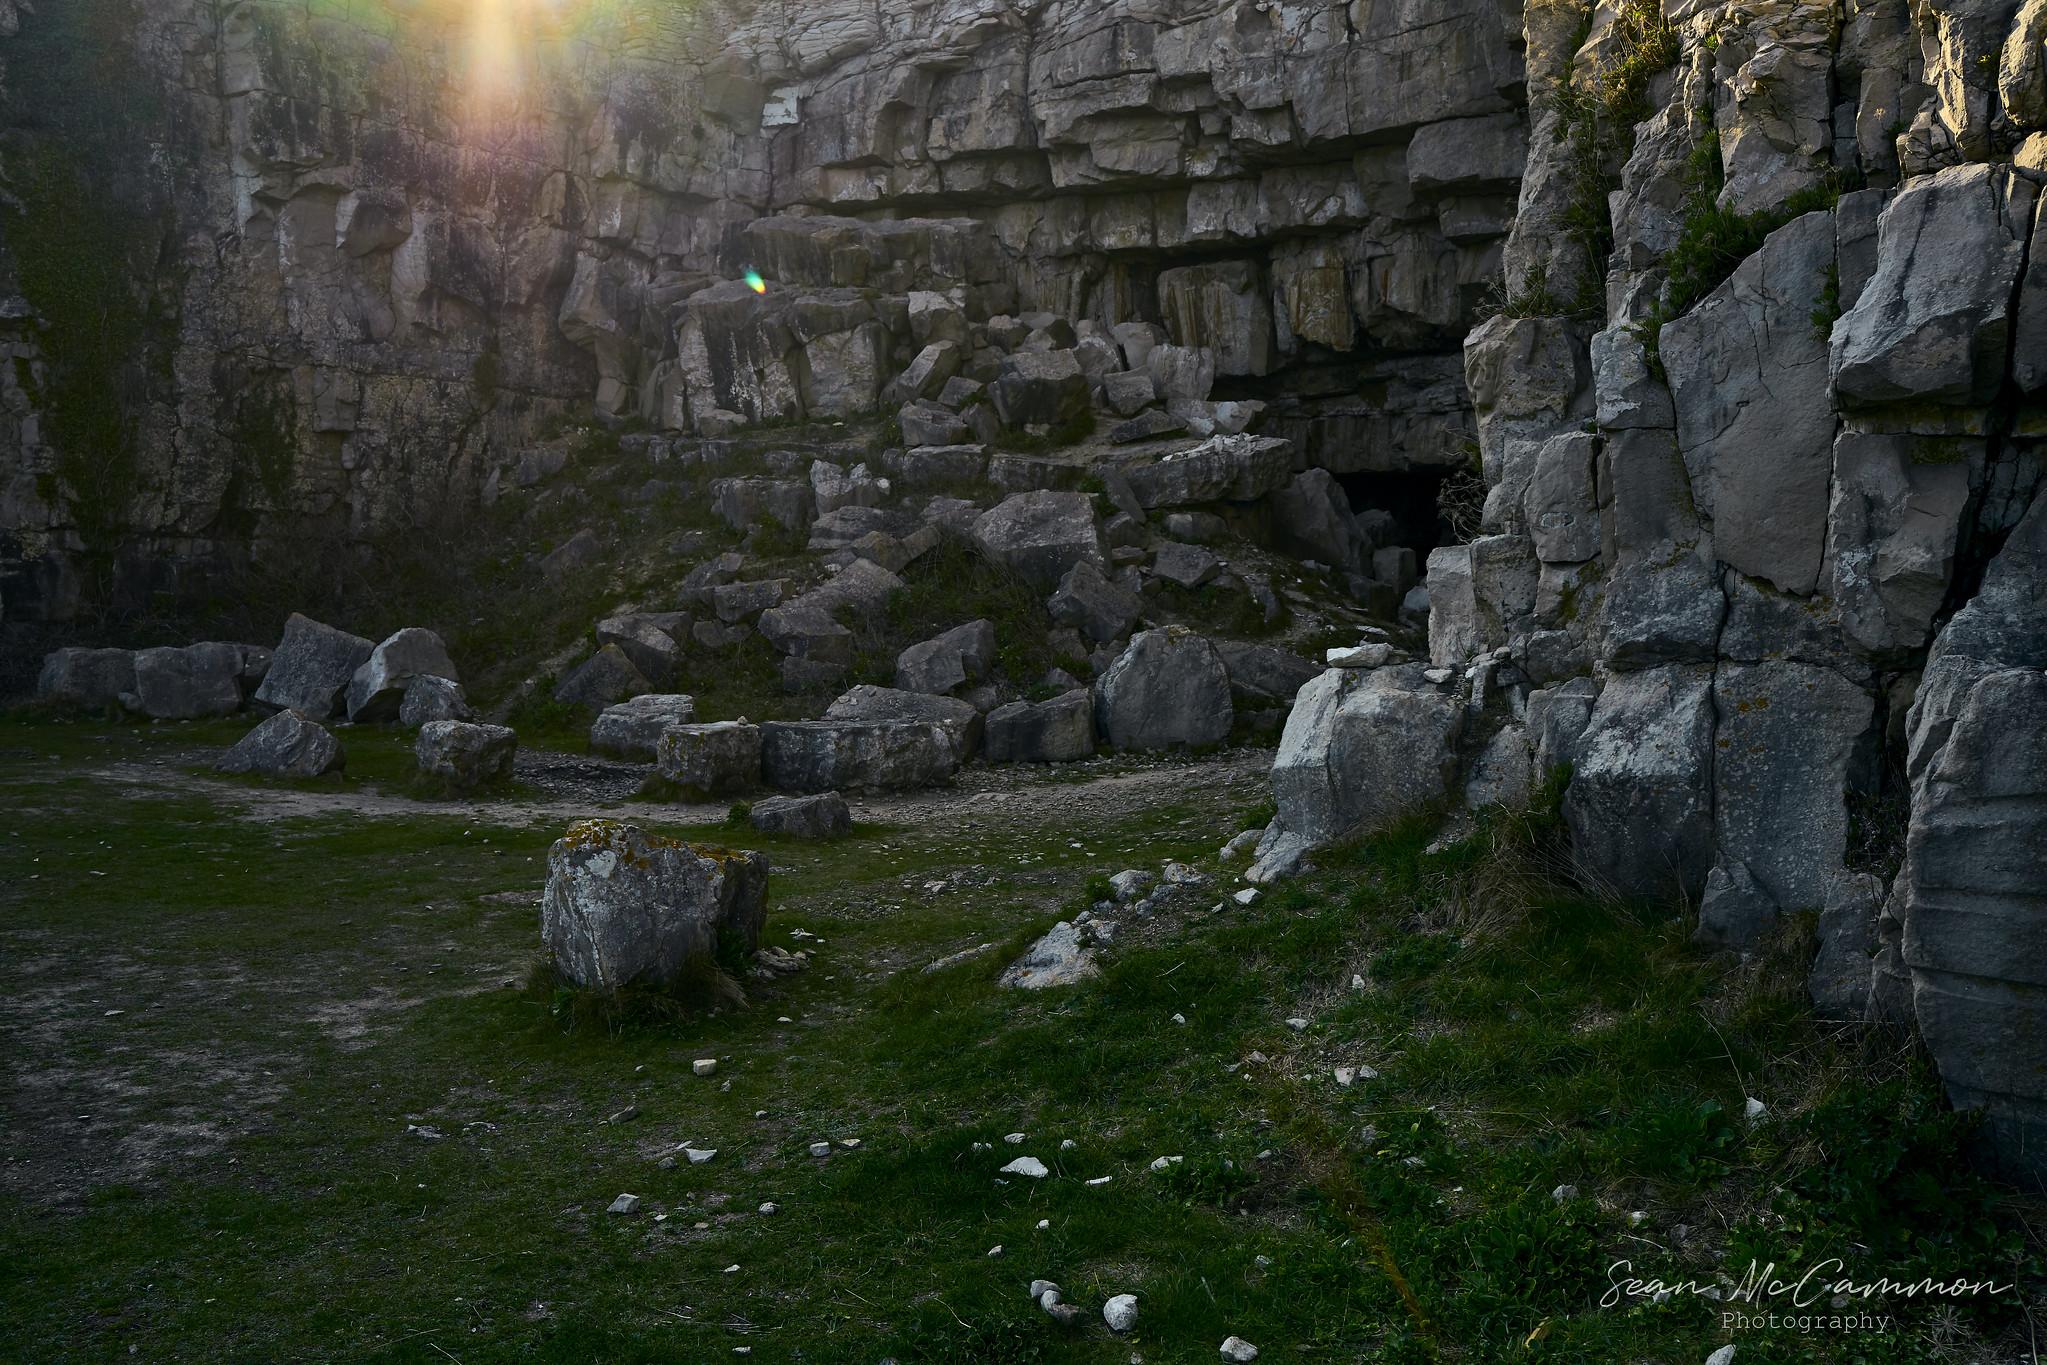 The Quarry Rock